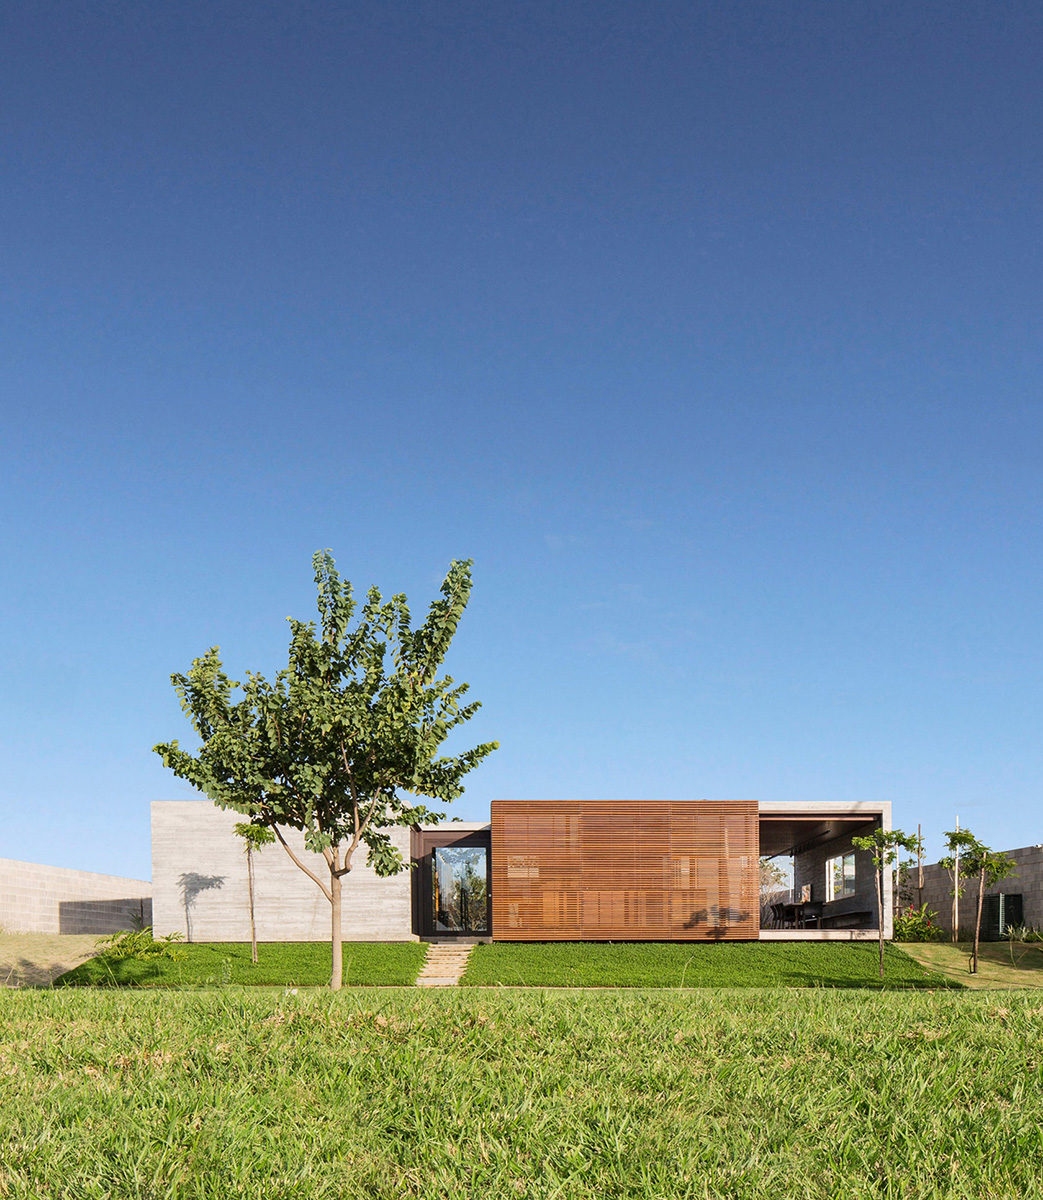 02-guths-house-arqbr-arquitetura-e-urbanismo